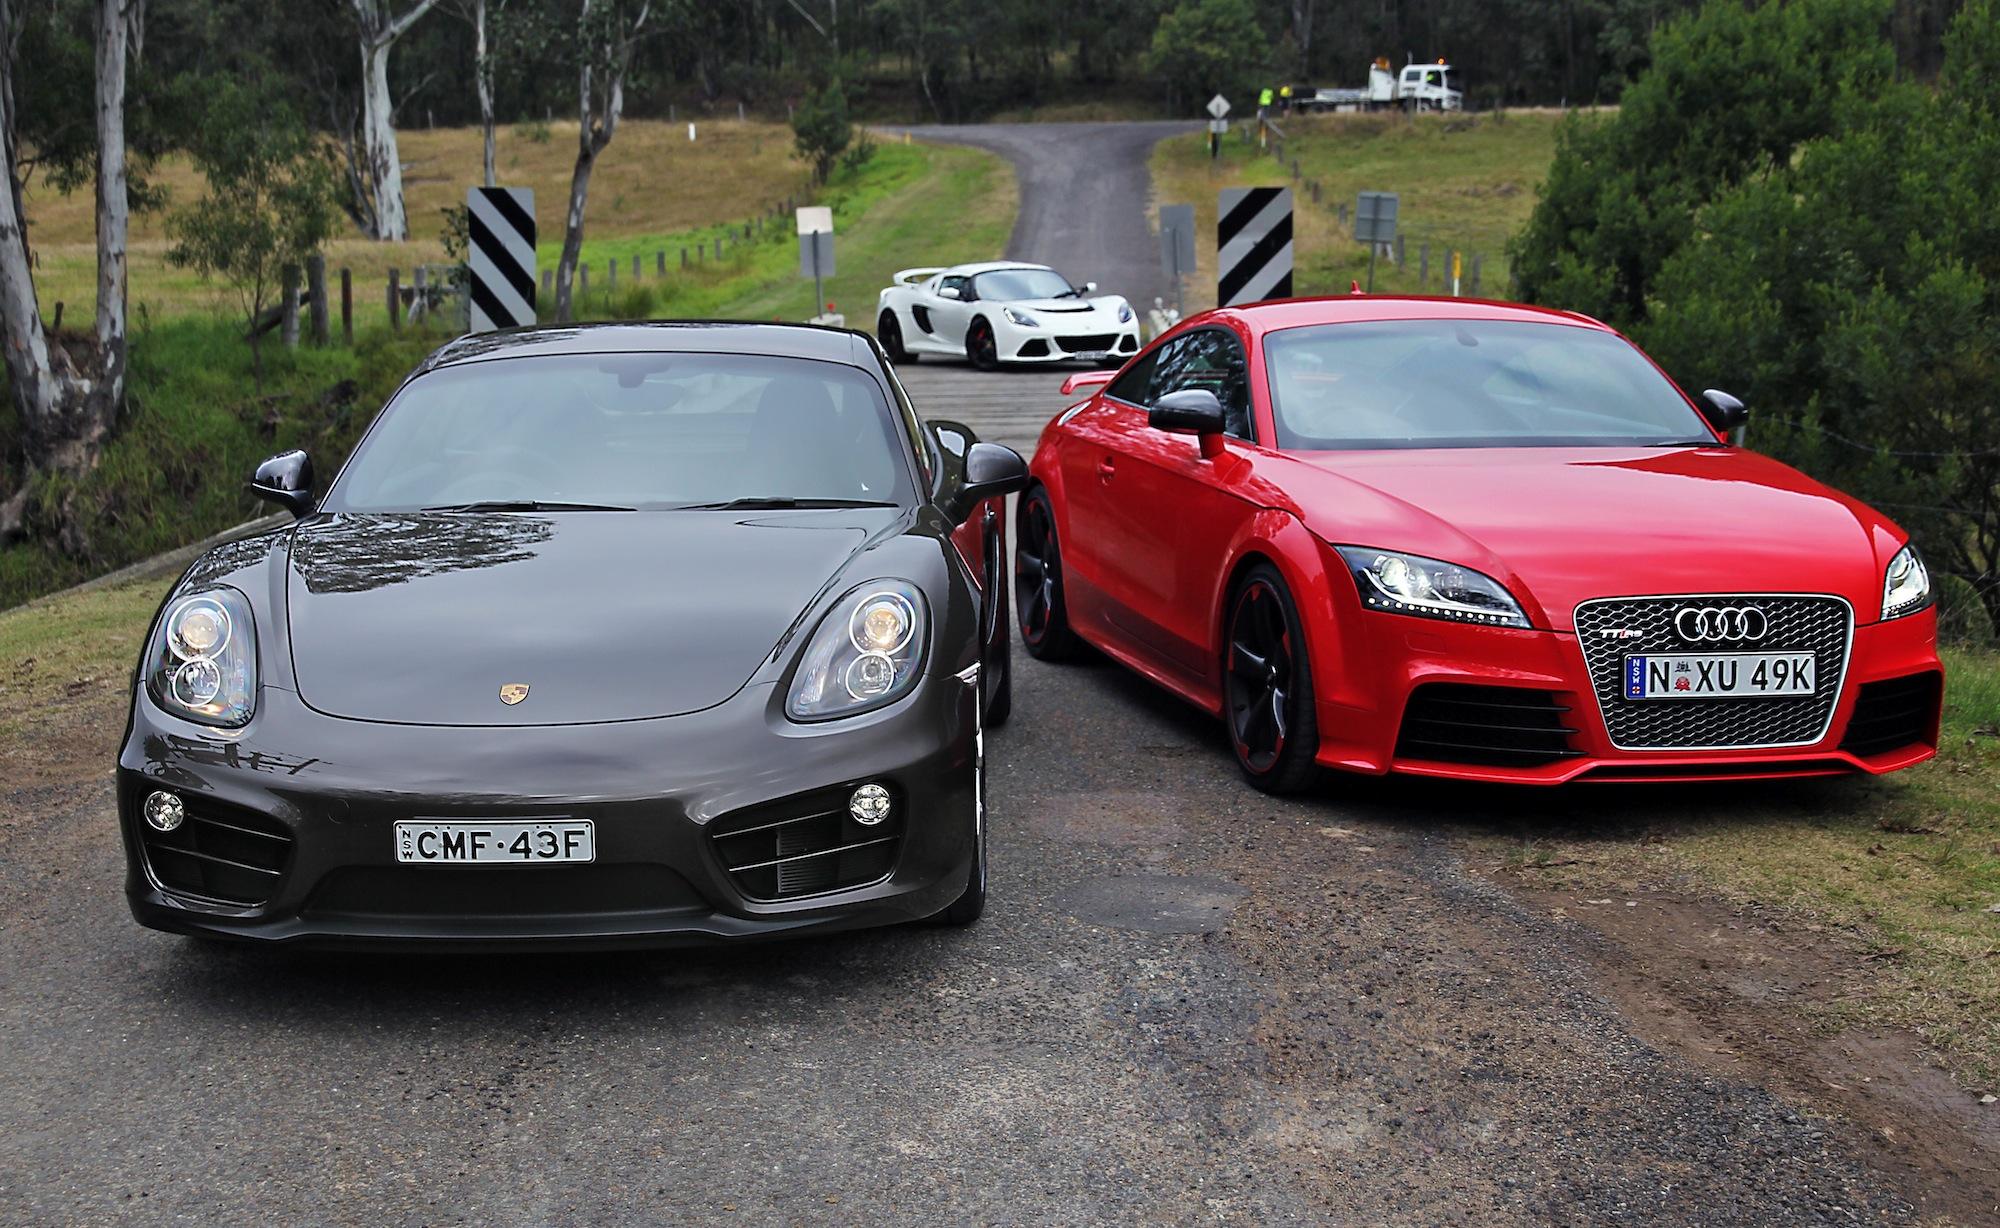 Sports Car Comparison Porsche Cayman V Audi Tt Rs V Lotus